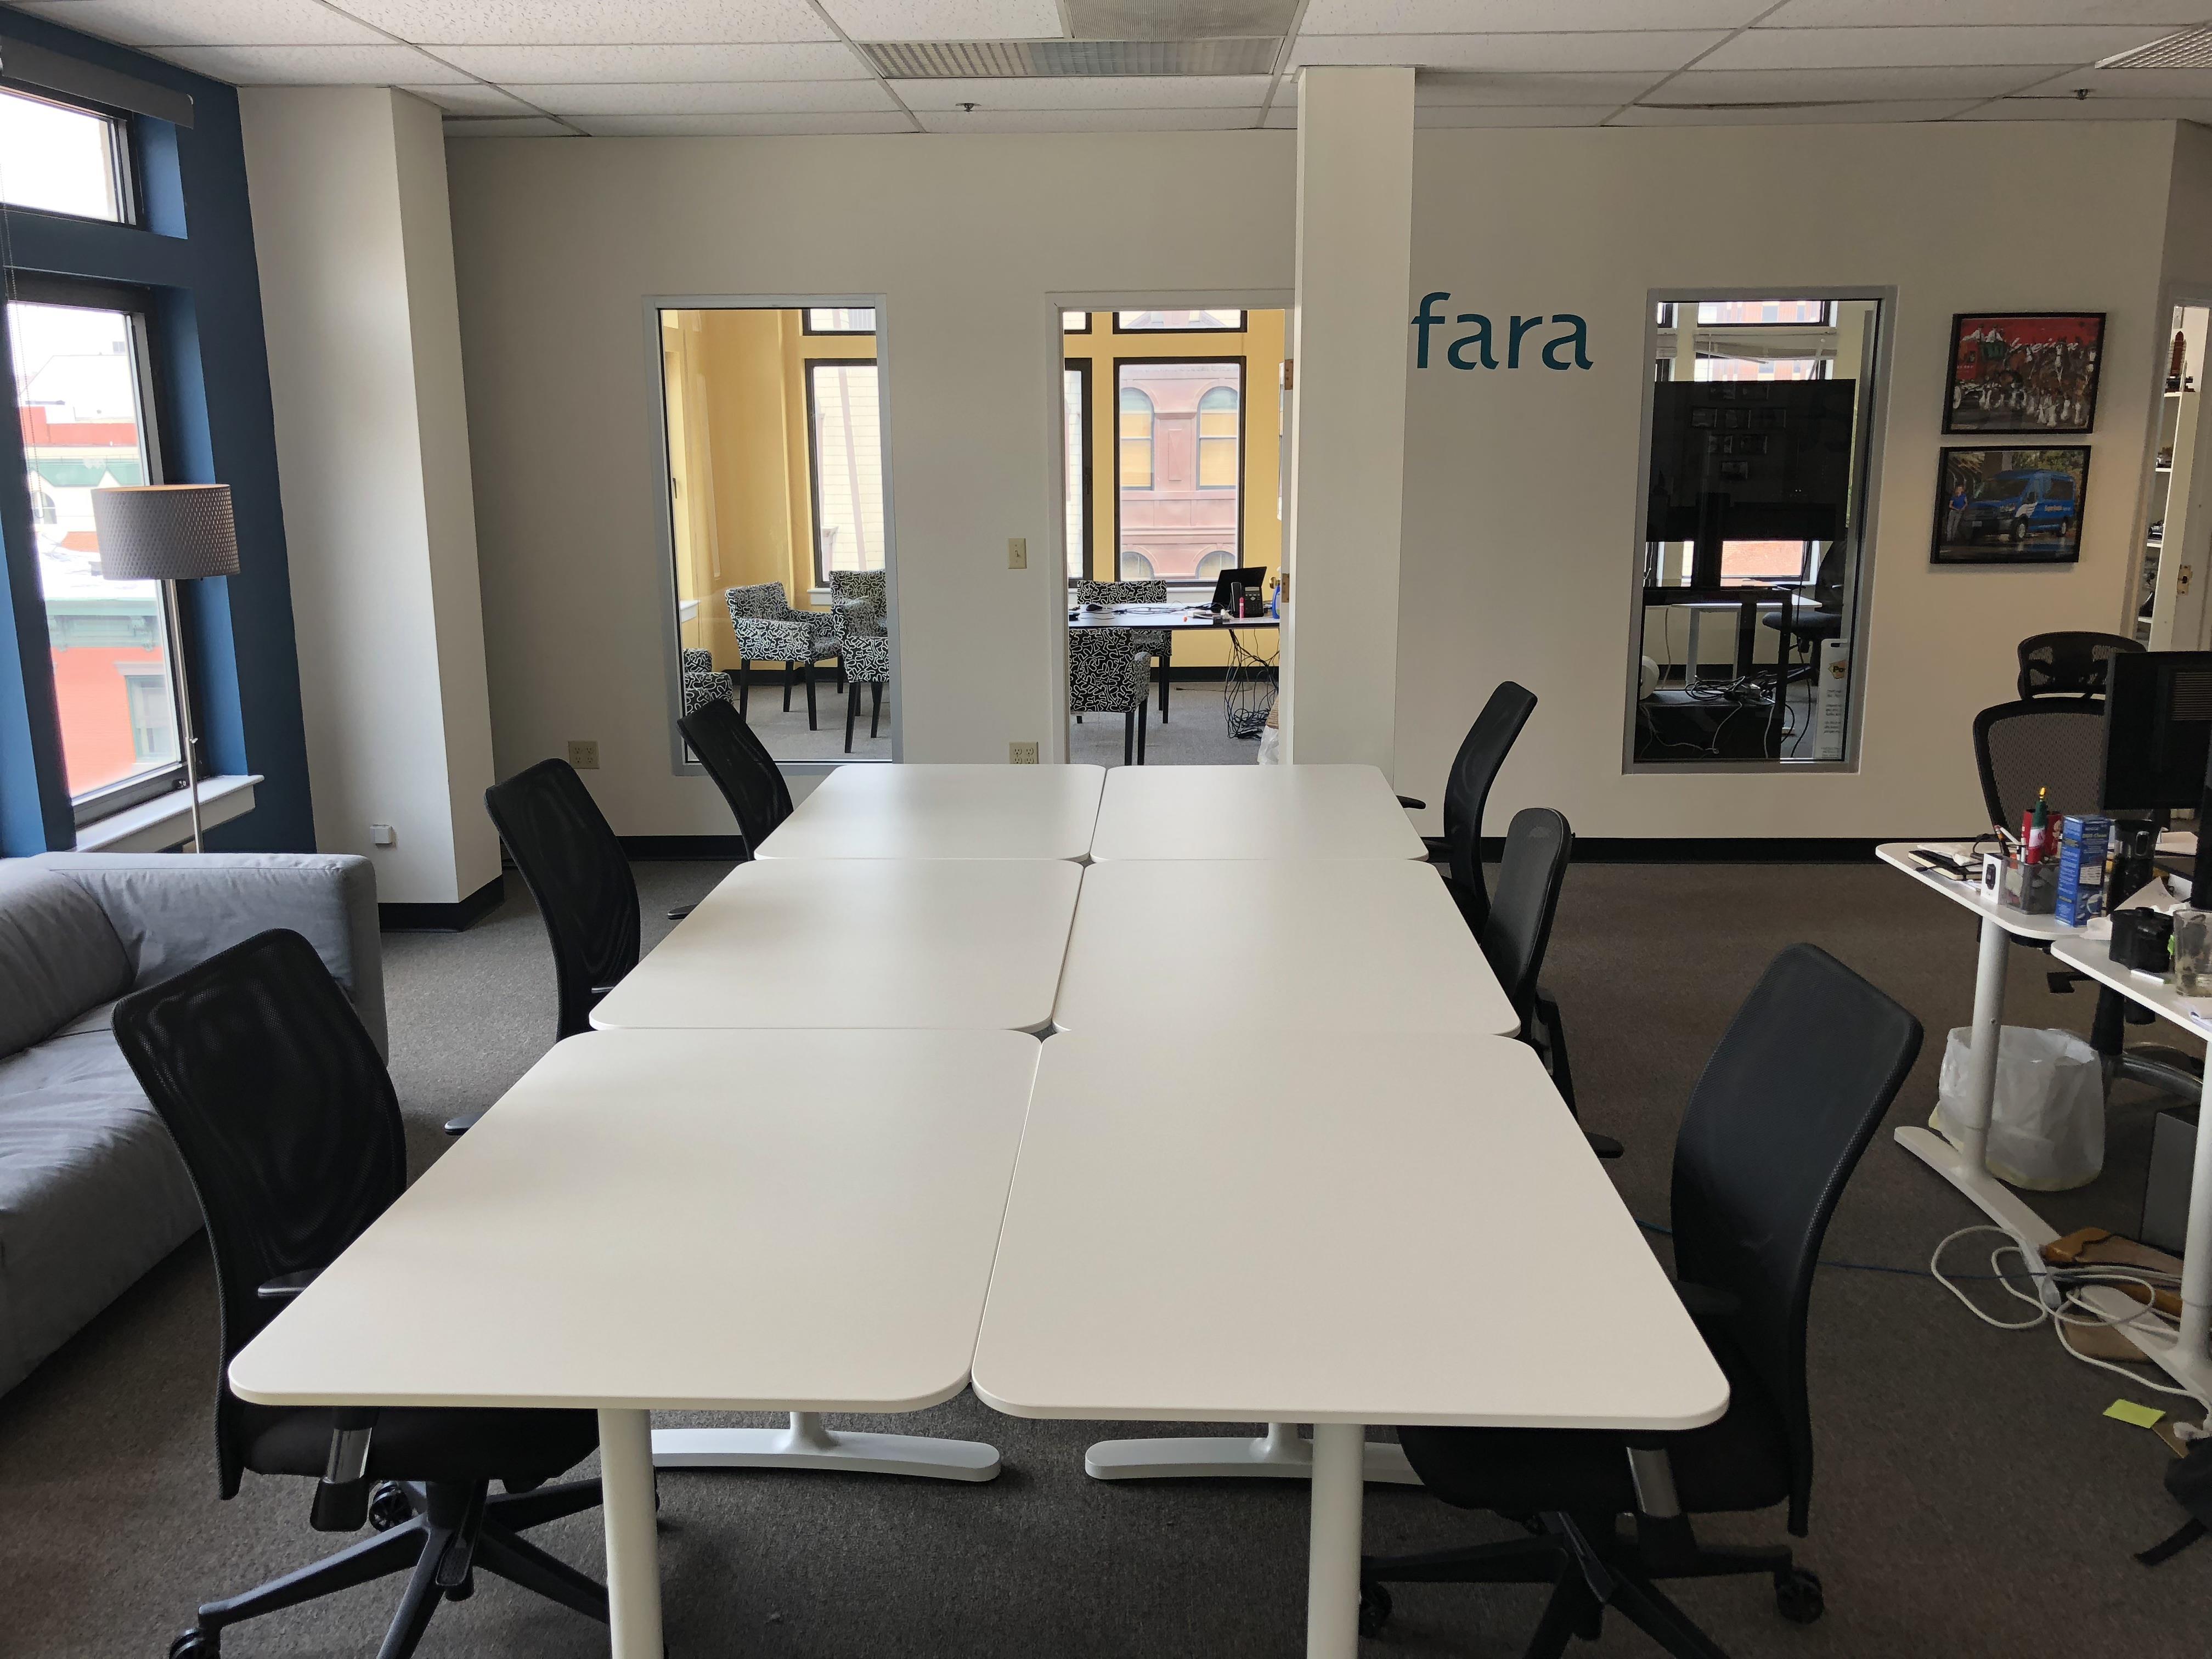 Sfara, Inc - Dedicated Desk 1